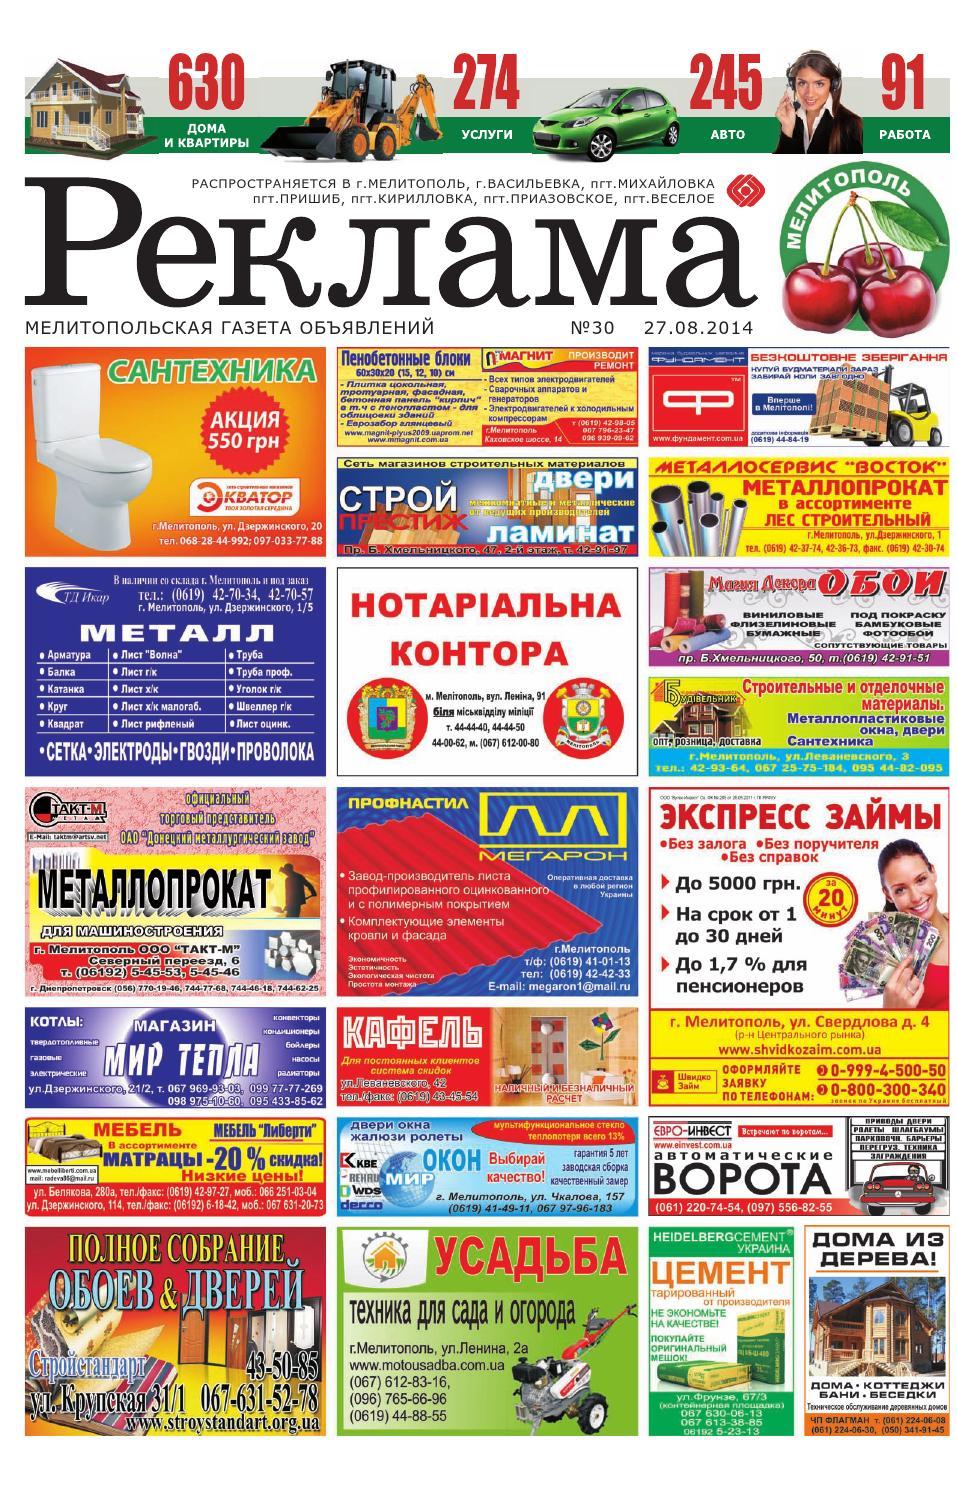 498a07ad9e1a Reklama 30 27 08 2014 by Юрий Бобков - issuu